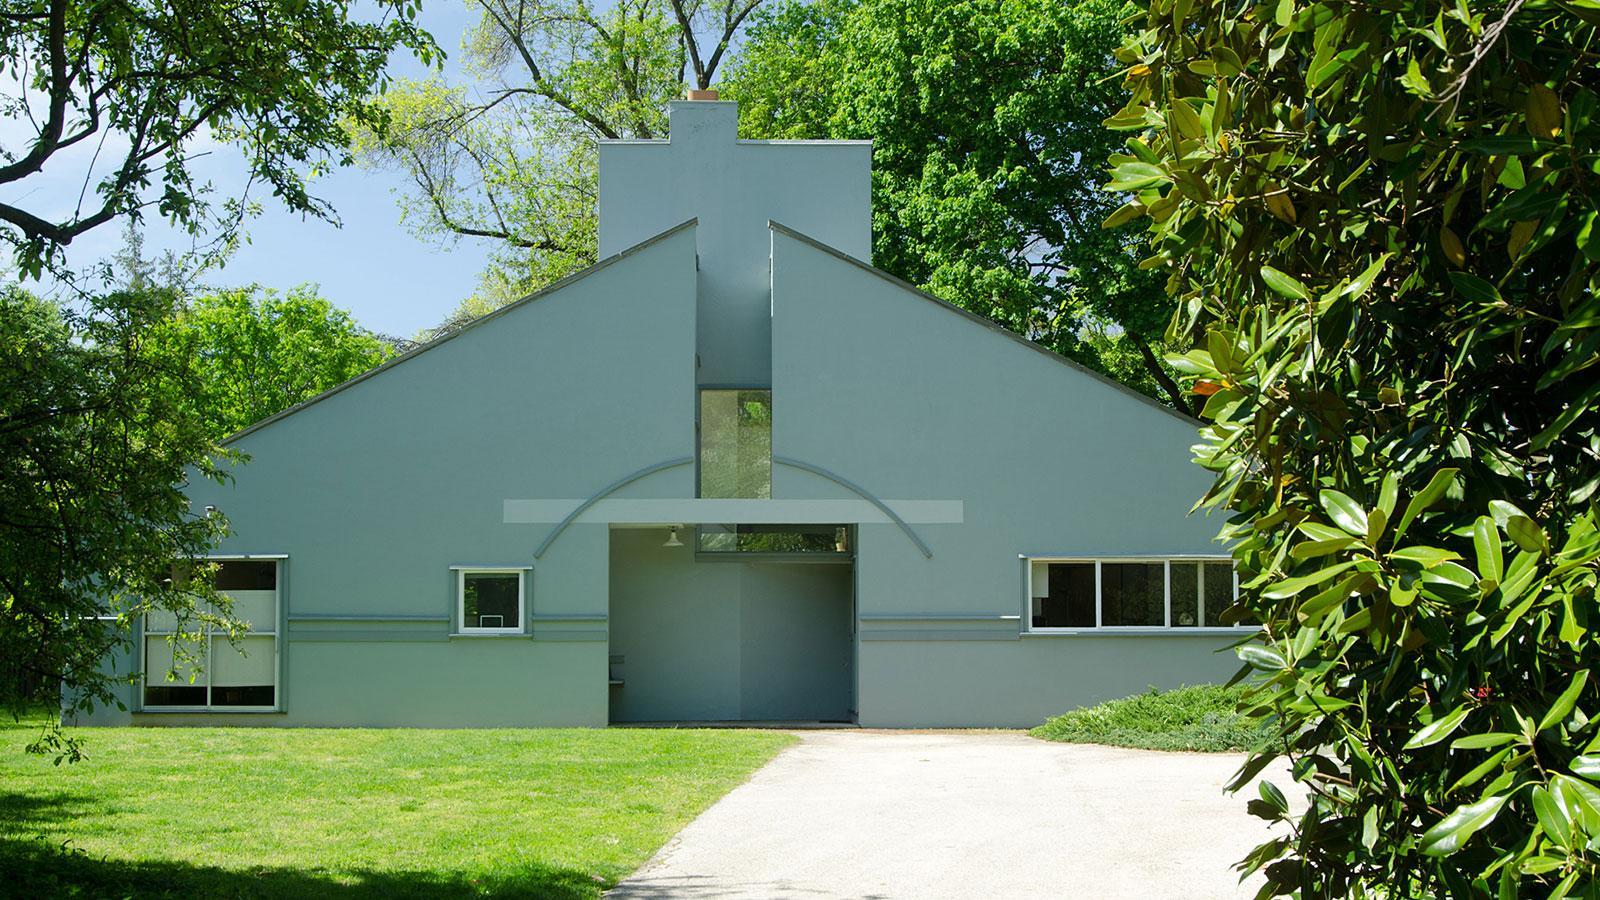 Vanna Venturi House | Ten Buildings that Changed America | WTTW Chicago